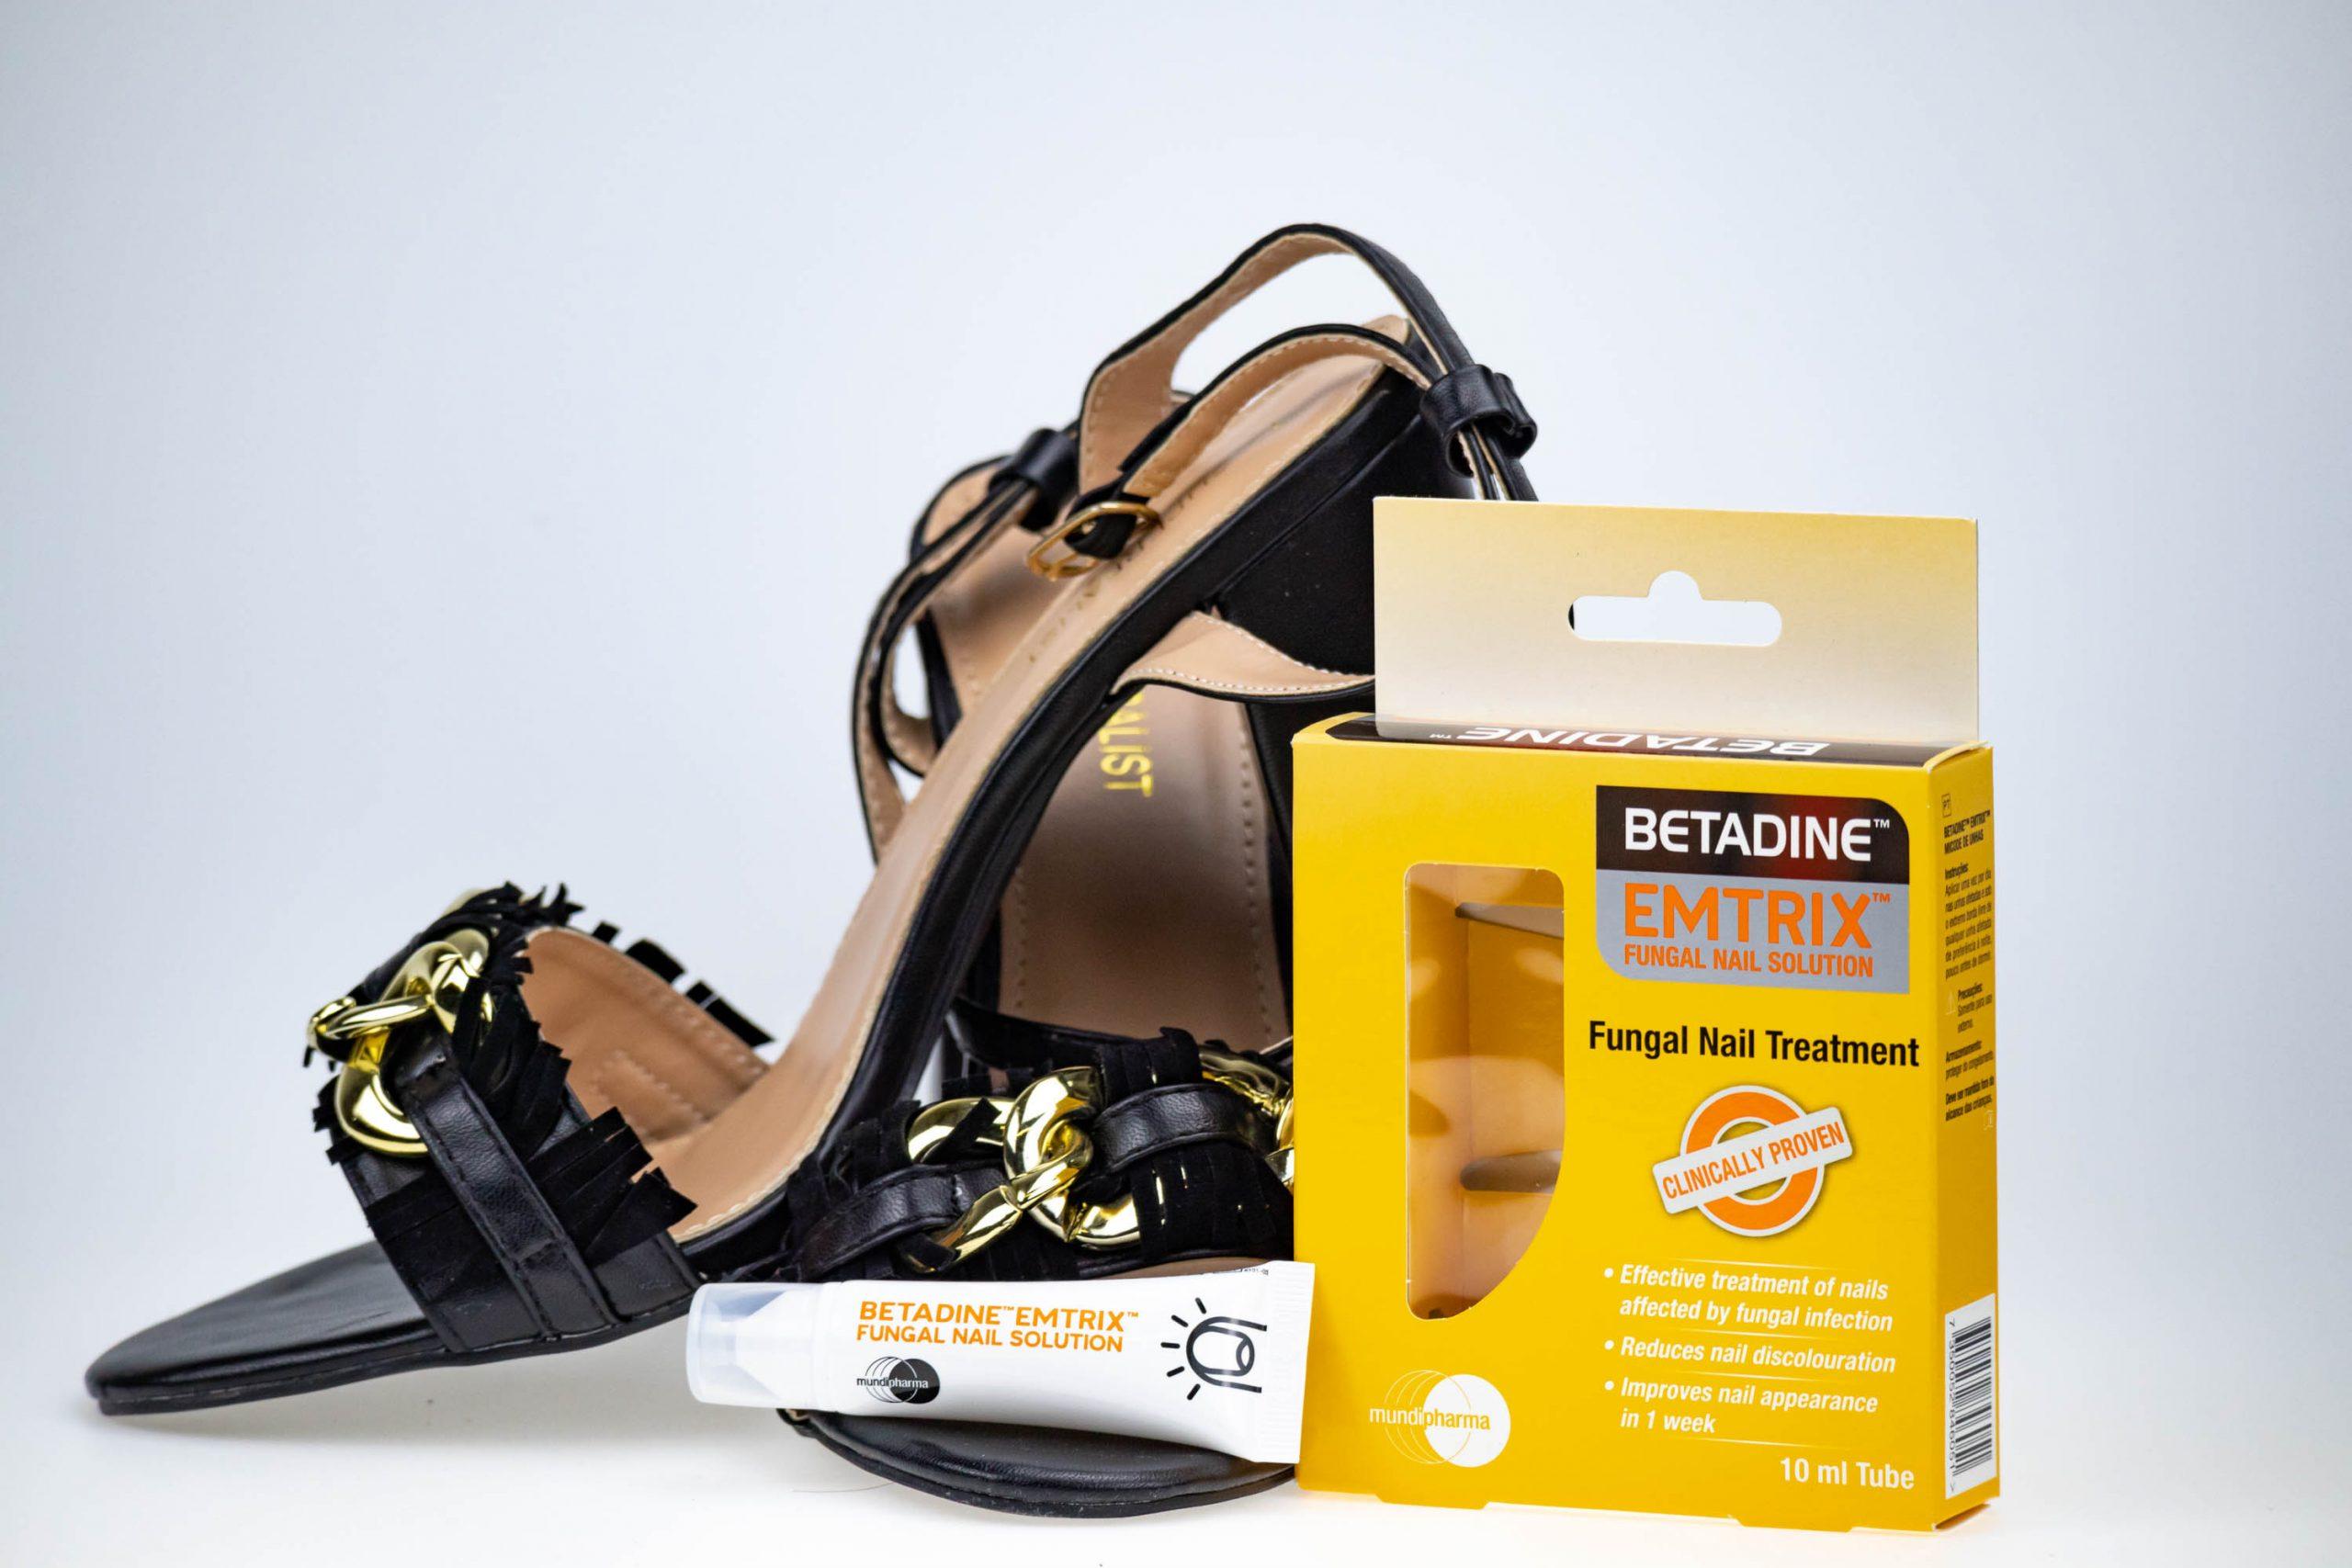 Betadine™ Emtrix™ Fungal Nail Solution